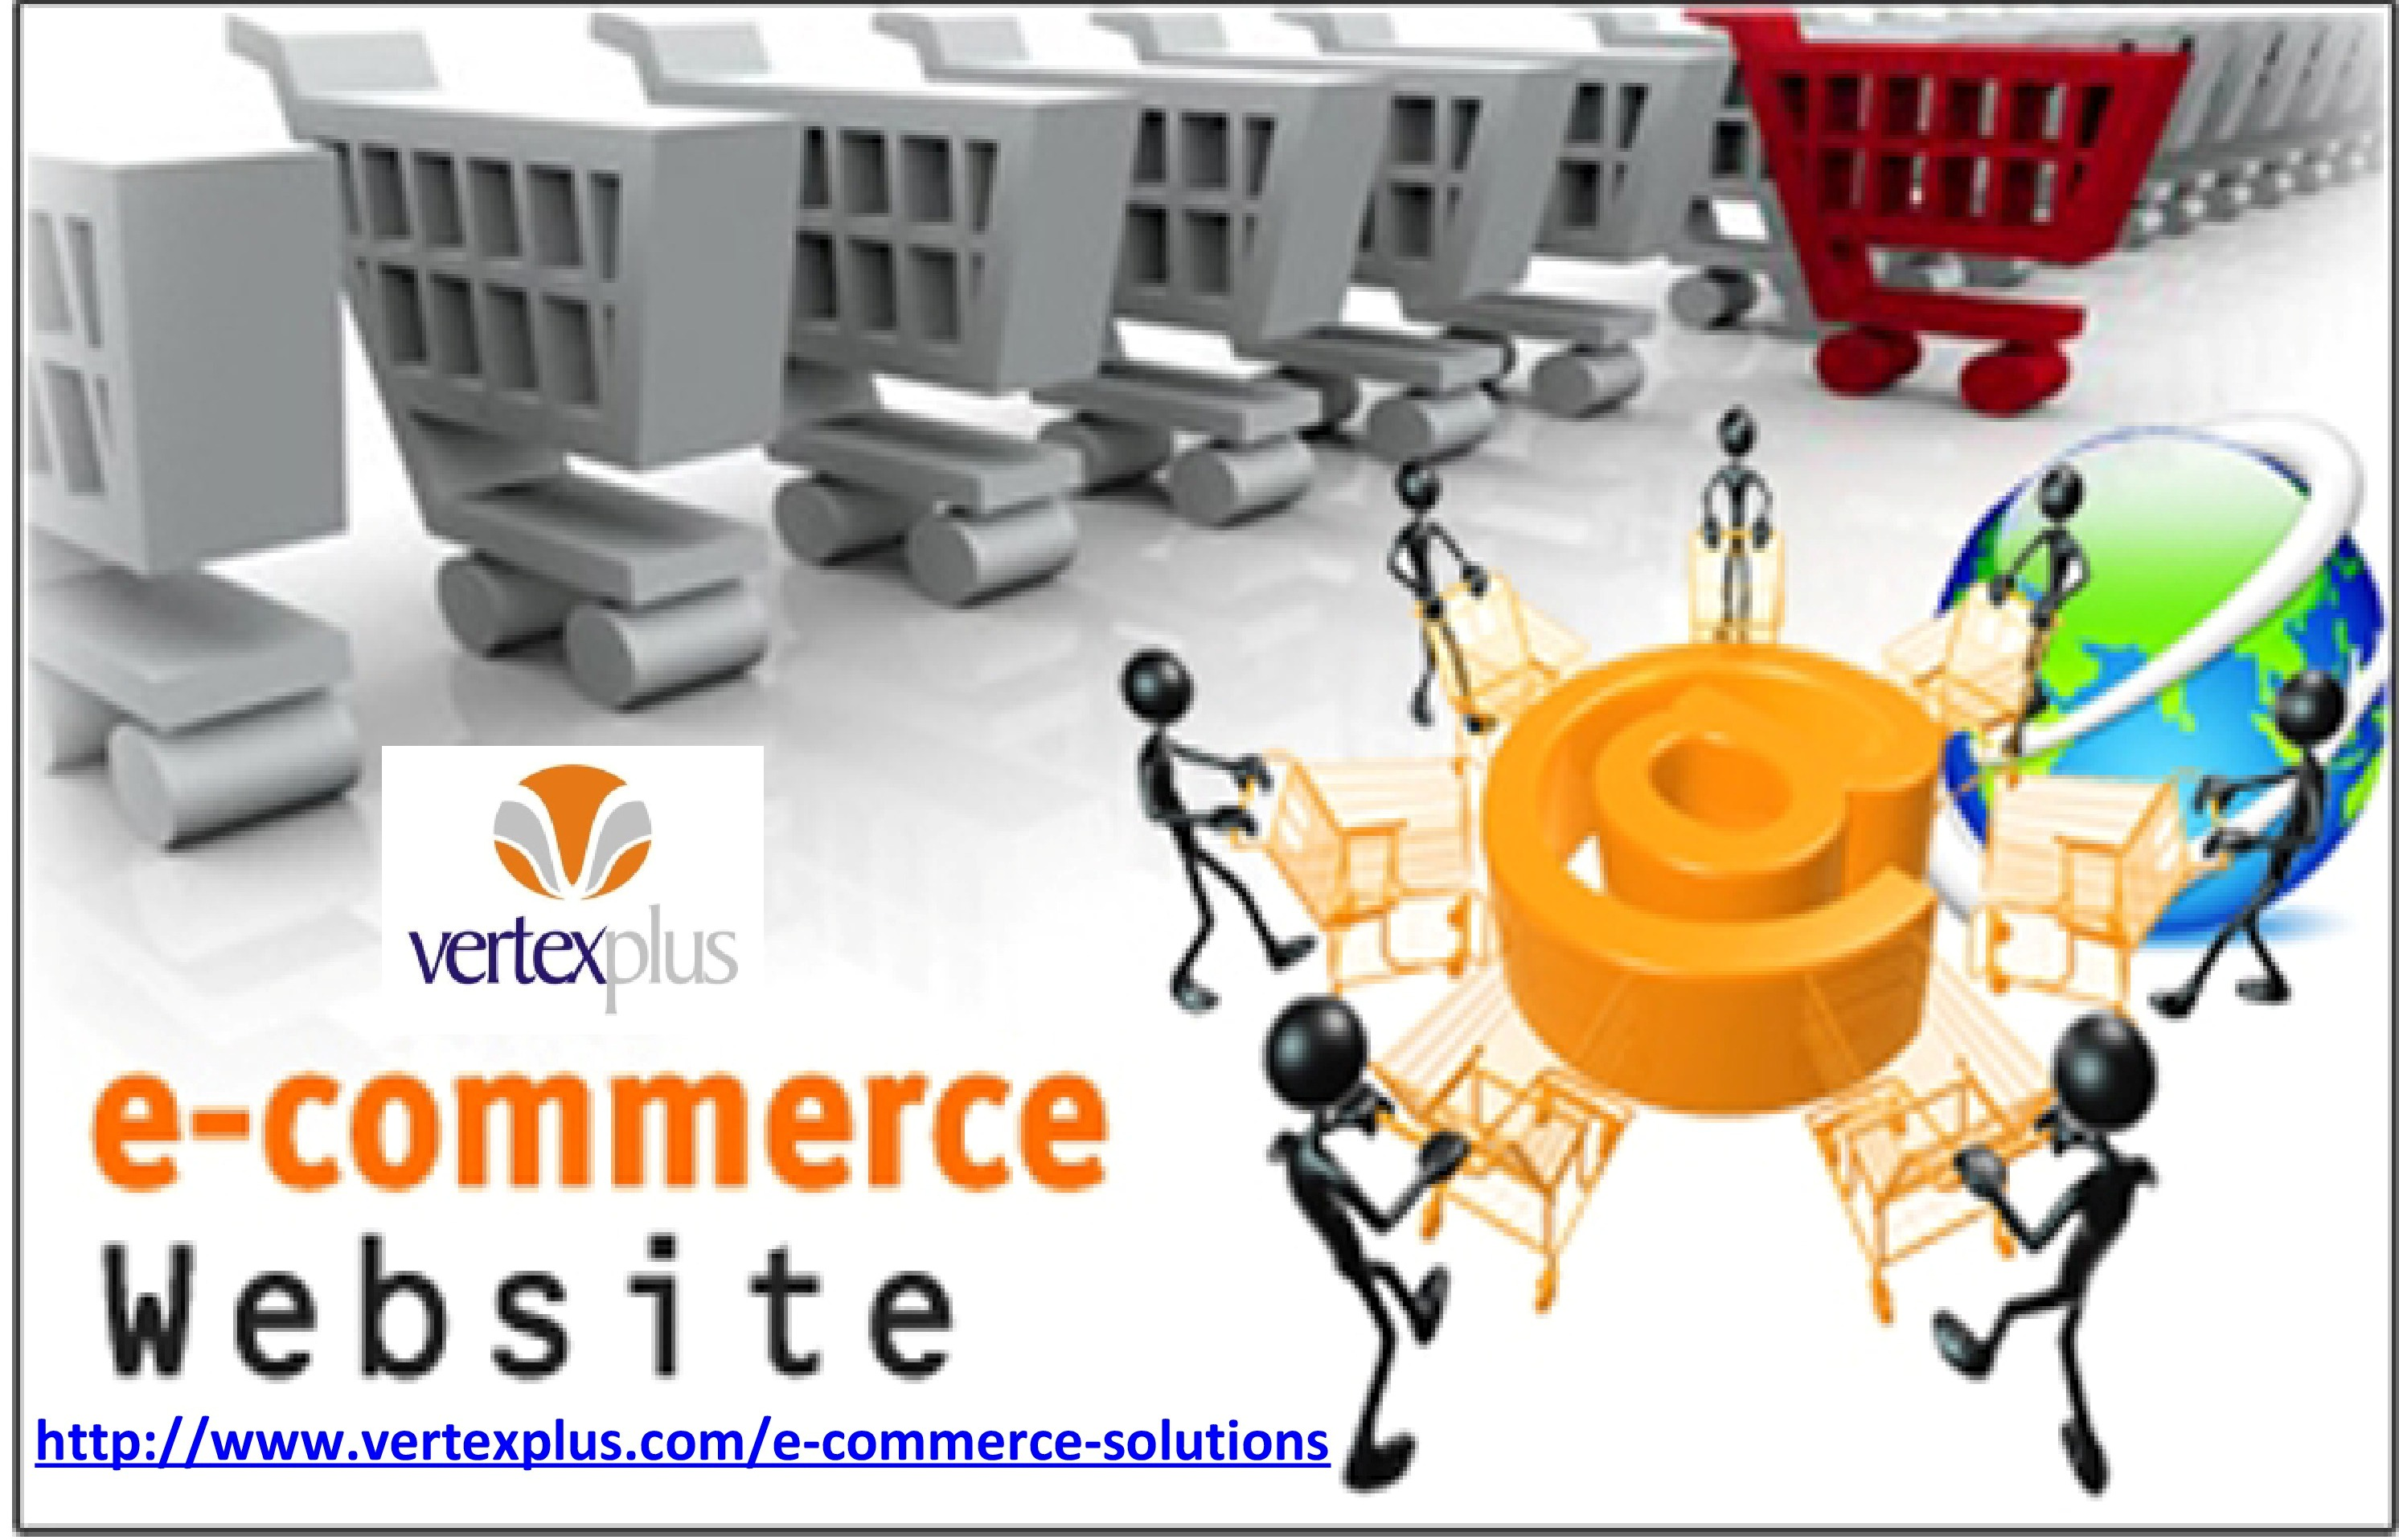 eCommerce Development.jpg  by vertexplus